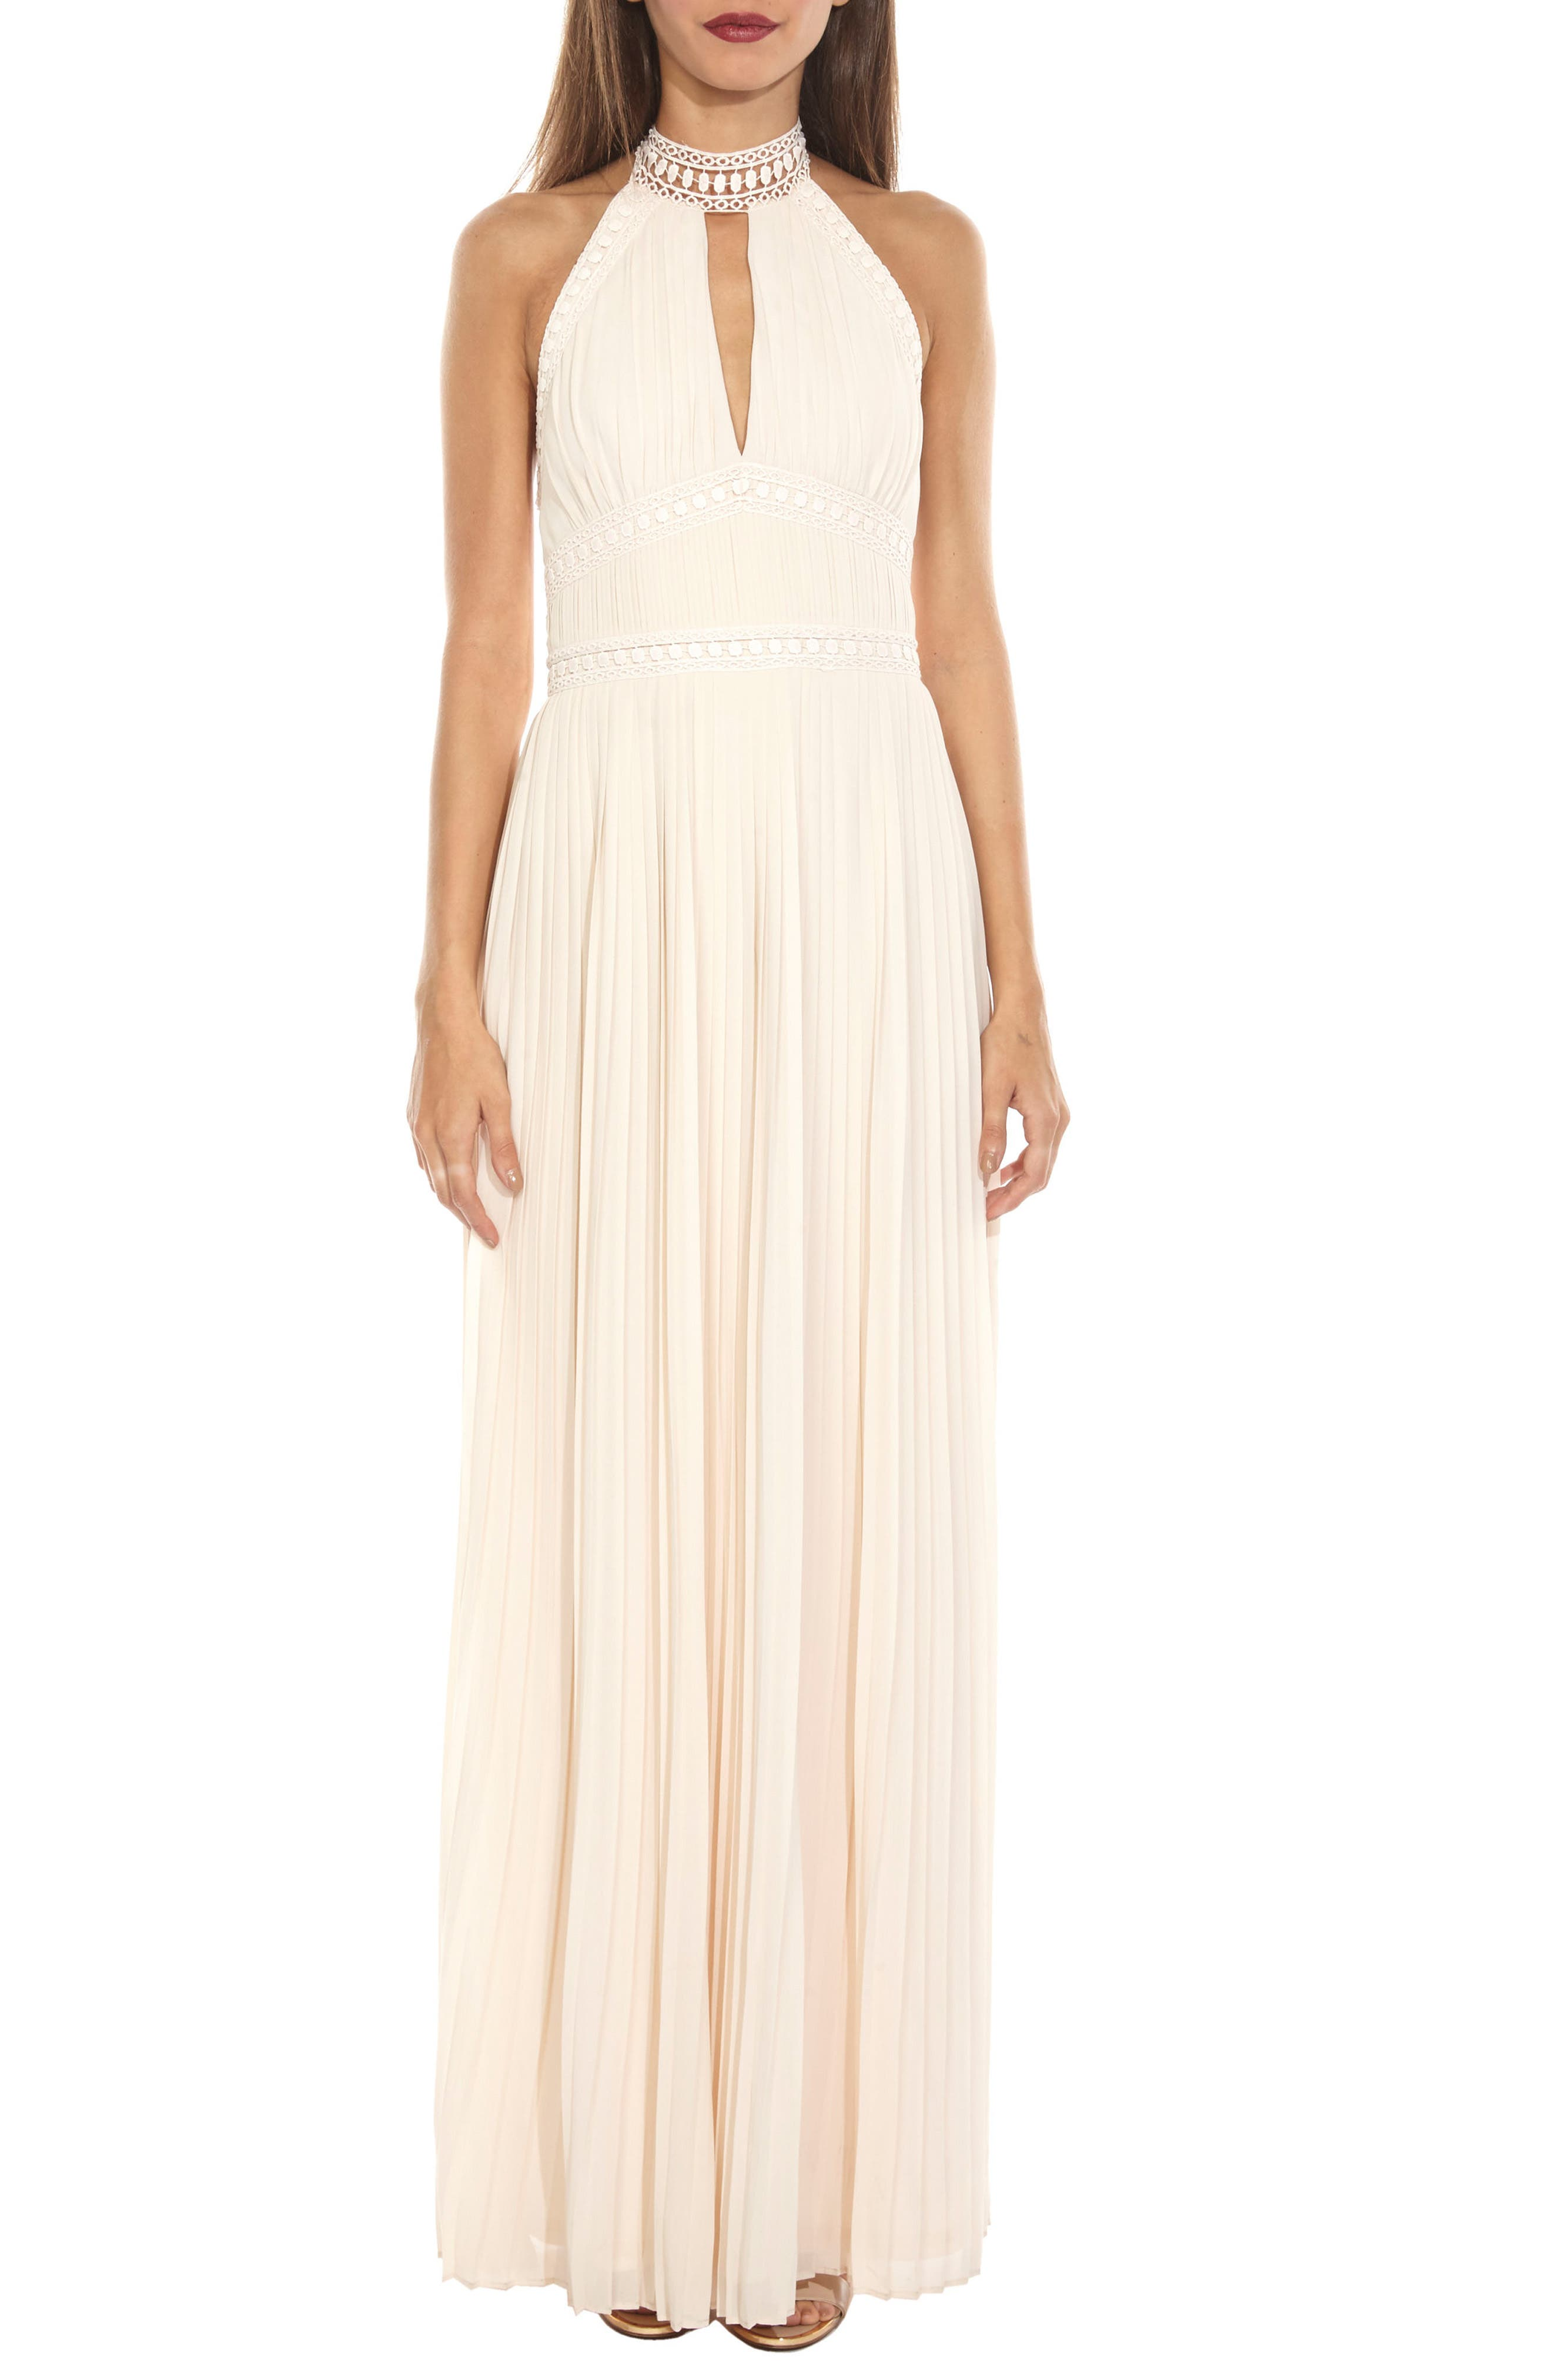 Corinne Lace Trim Halter Maxi Dress,                             Main thumbnail 1, color,                             Nude